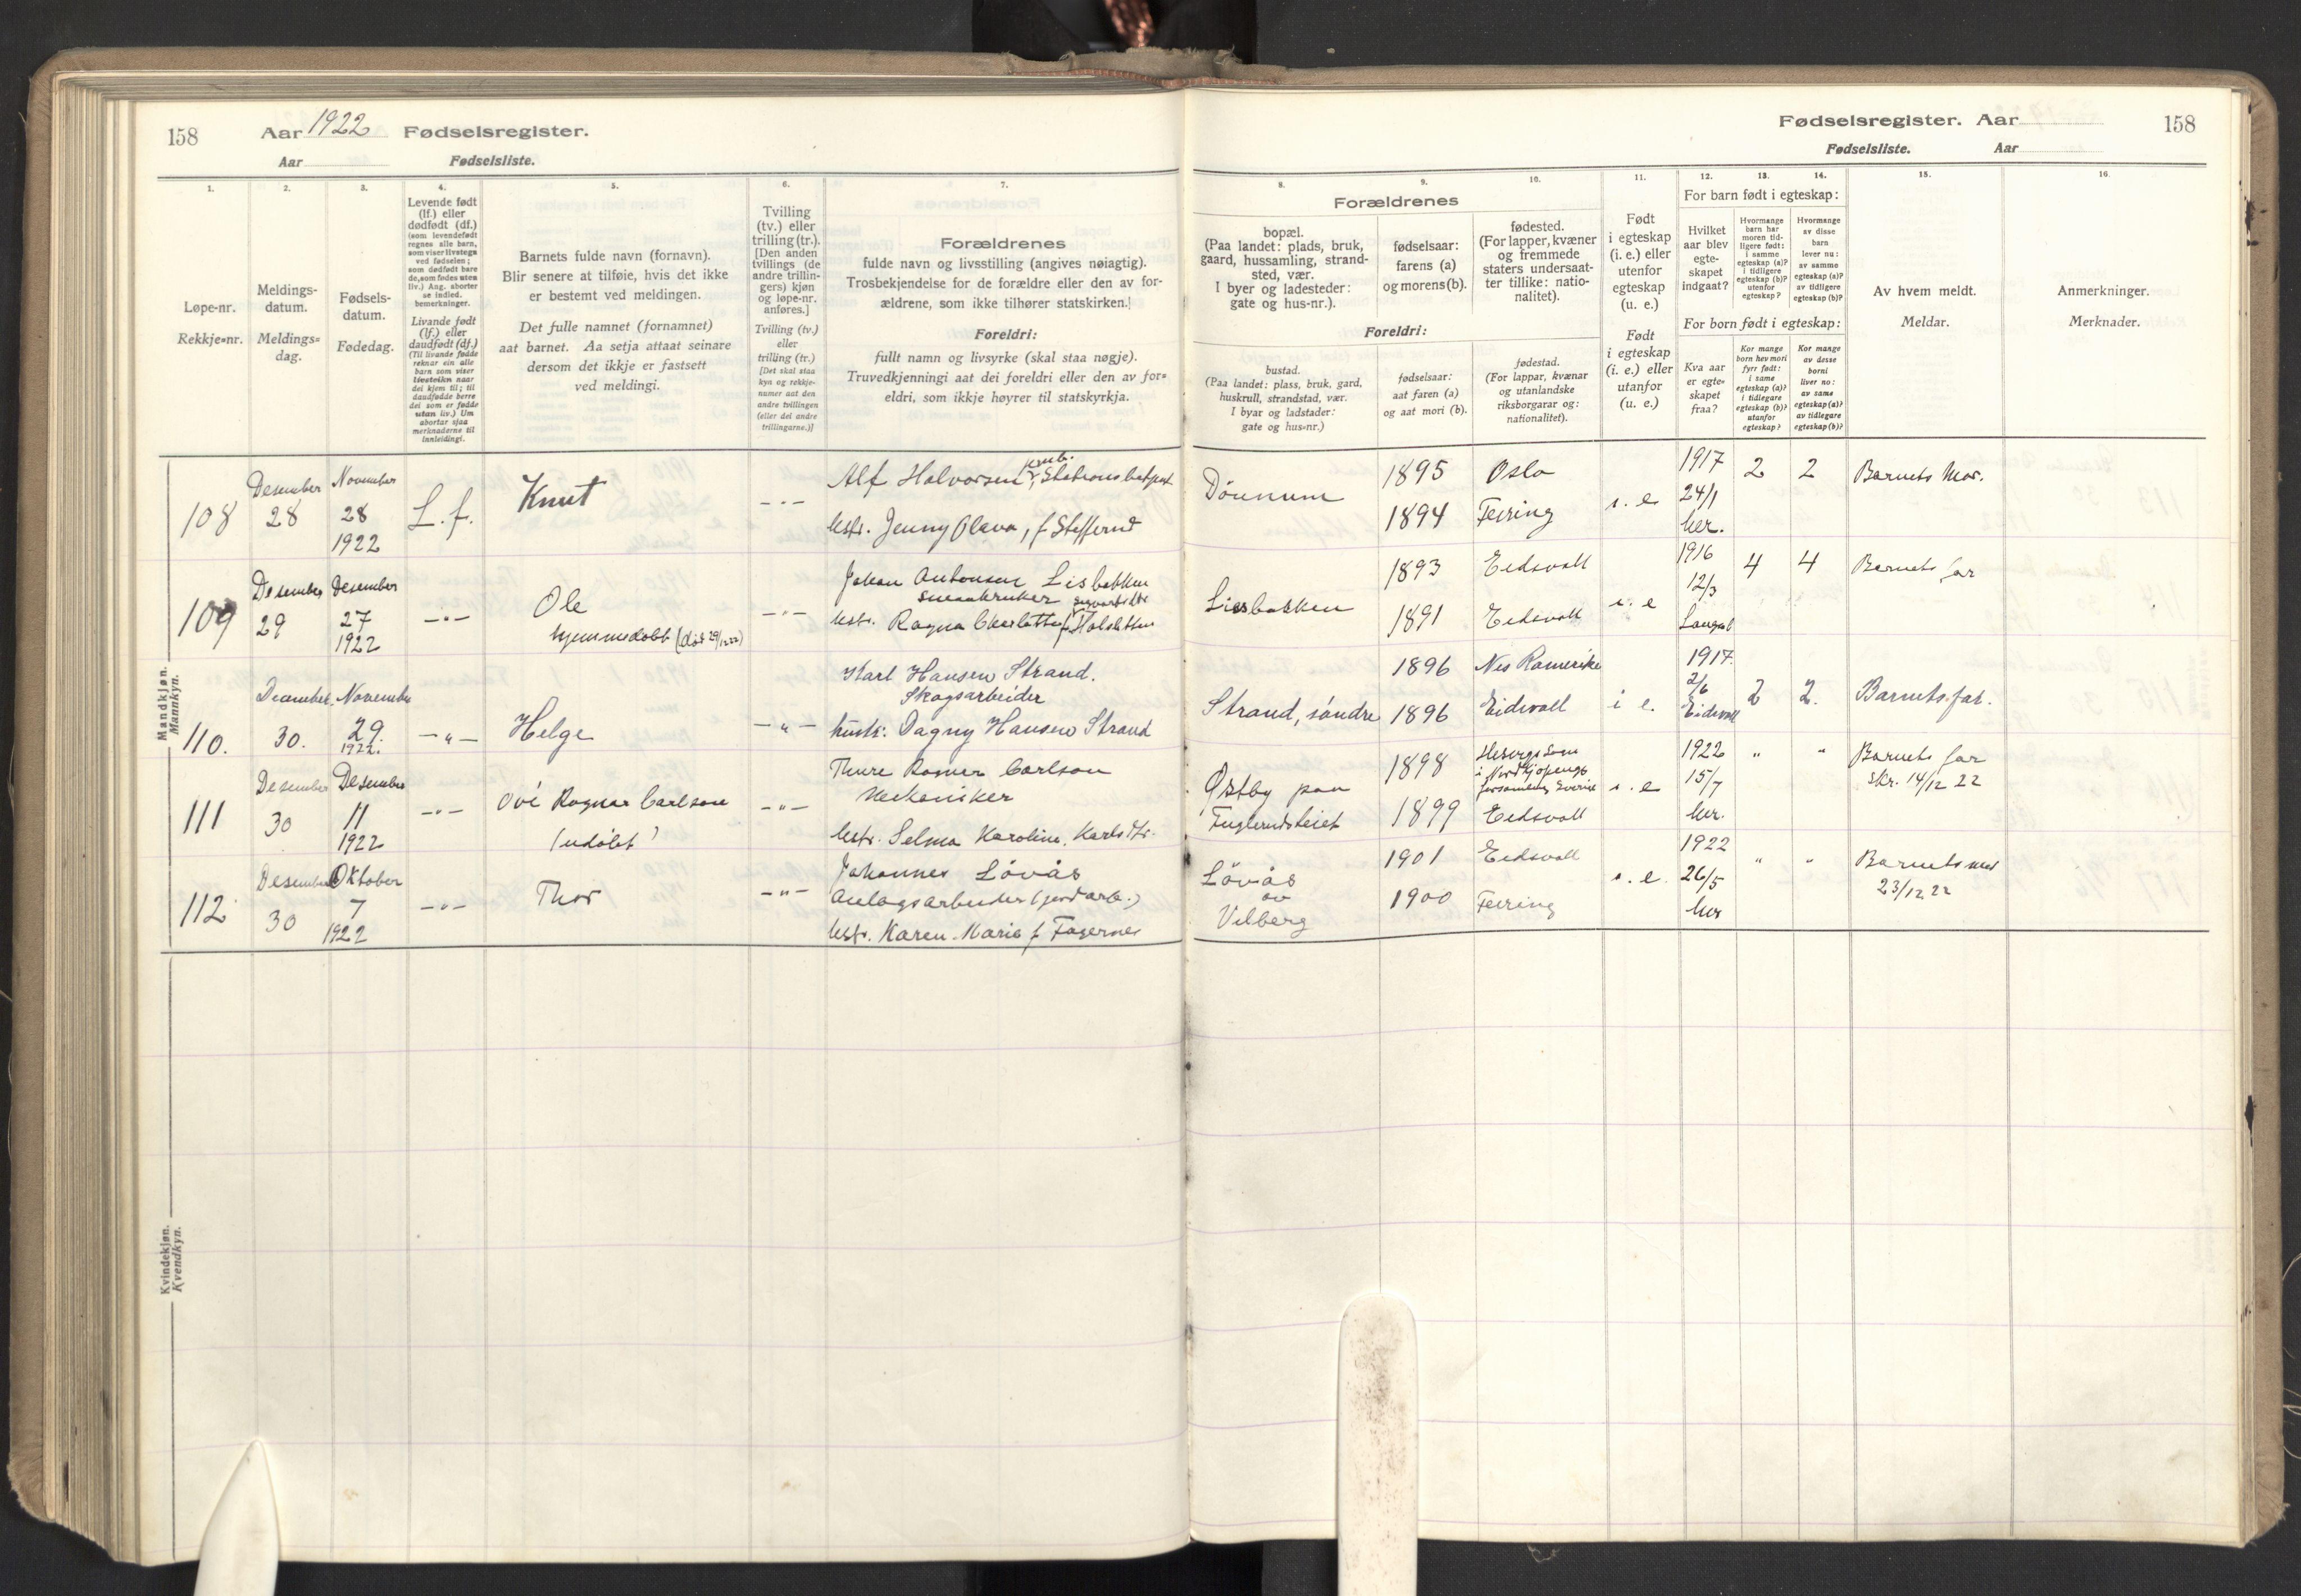 SAO, Eidsvoll prestekontor Kirkebøker, Birth register no. I 1, 1916-1924, p. 158